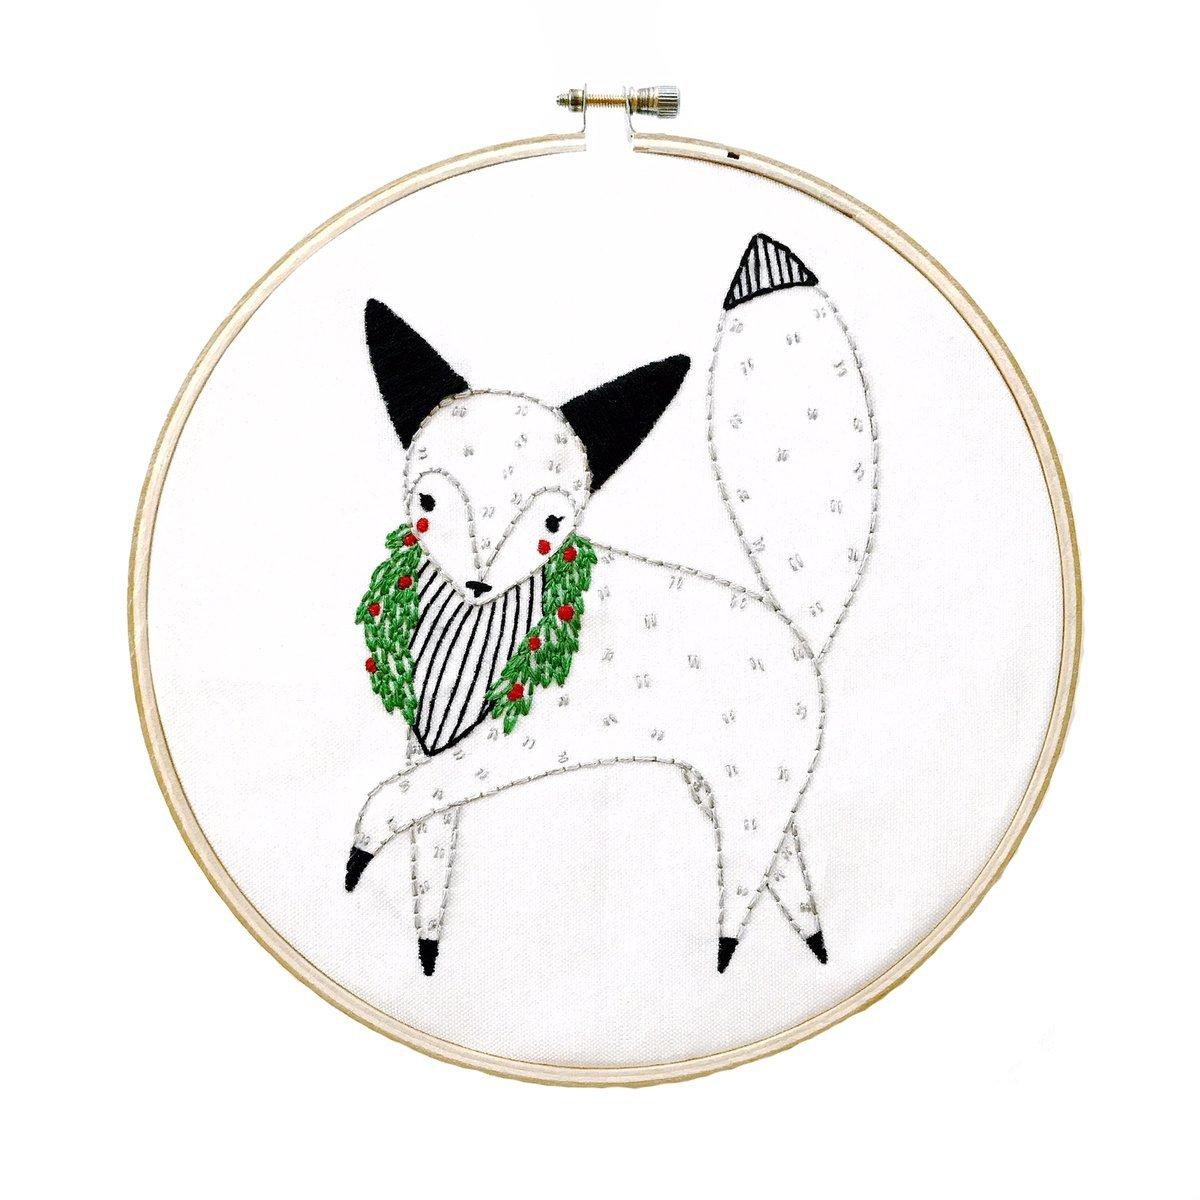 Embroidery Sampler Merriment Arctic Fox - Gingiber